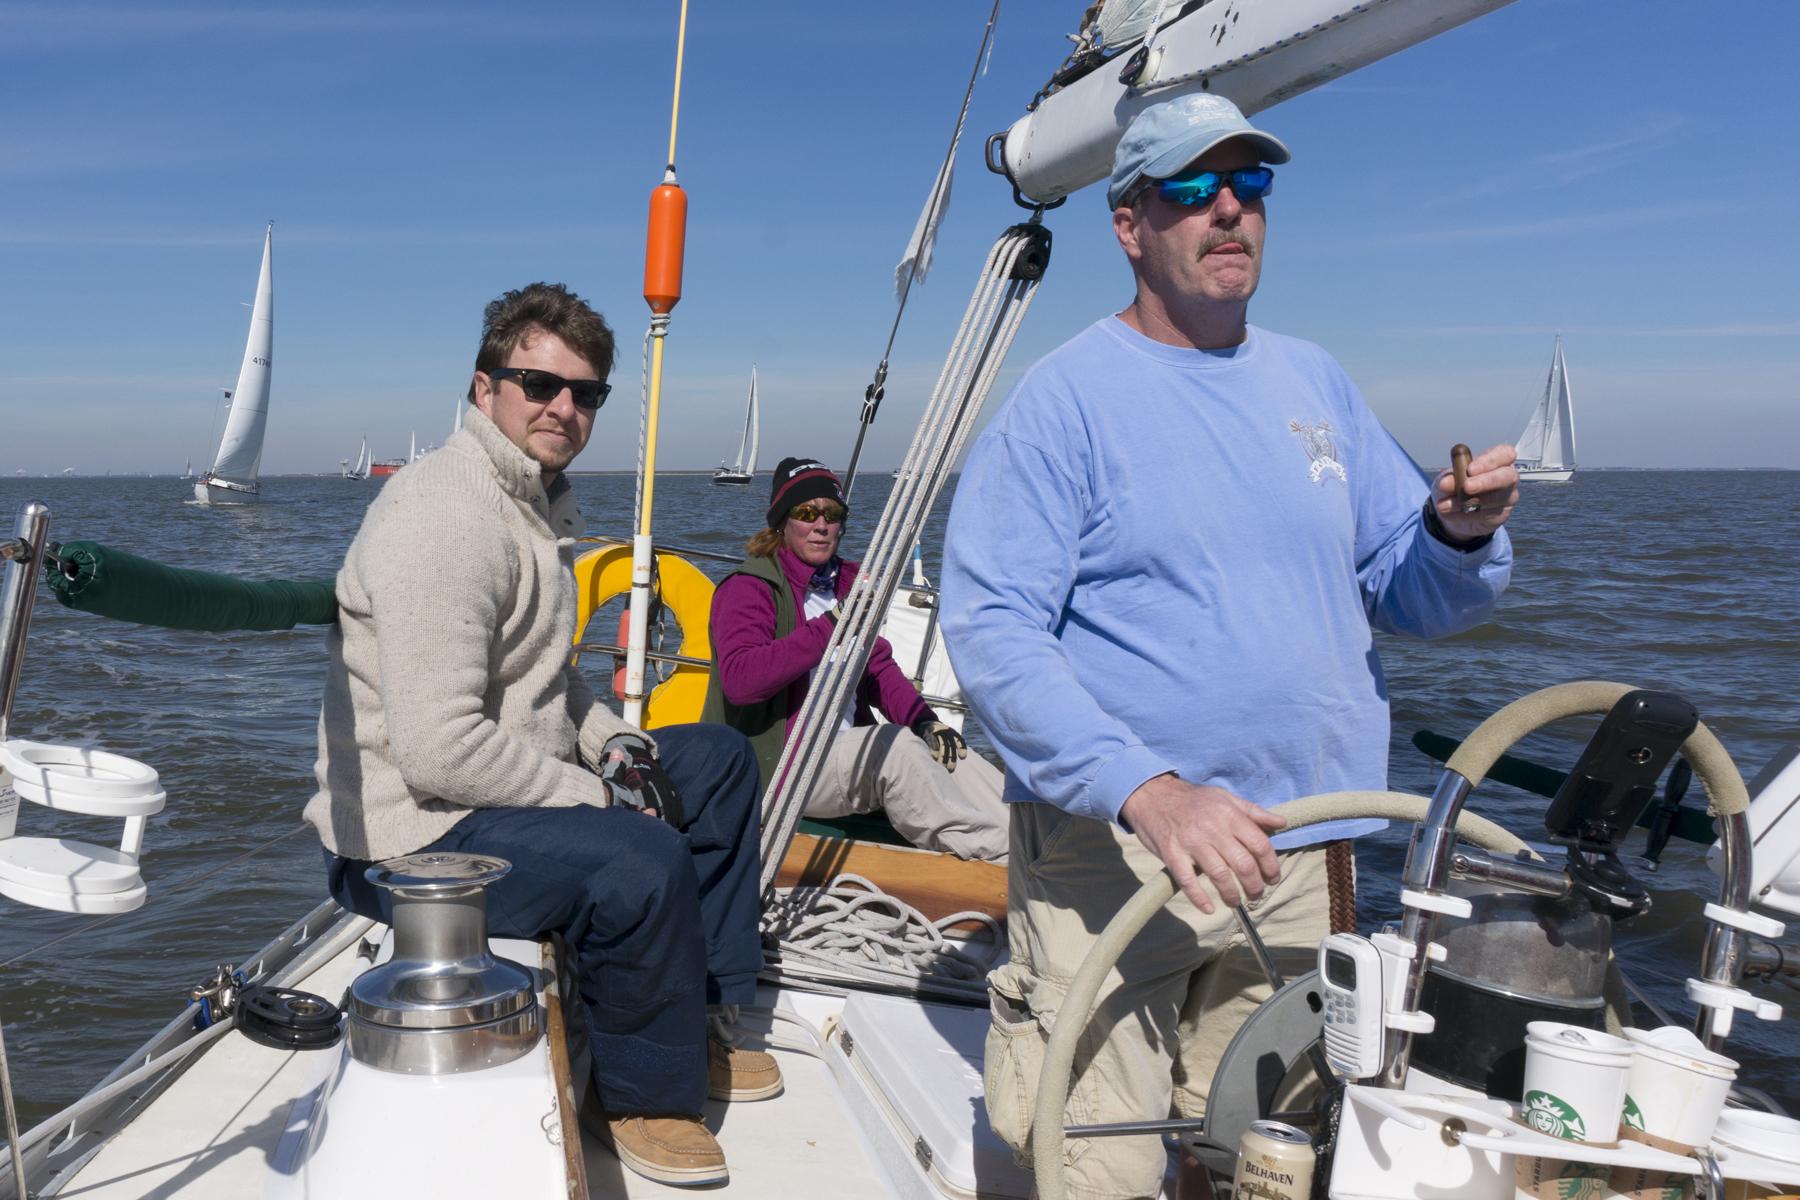 Sv Gimme Shelter Svgimmeshelter Page 21 Egret Boat Wiring Harness Dsc08141 Dsc08091 Dsc08137 Dsc08136